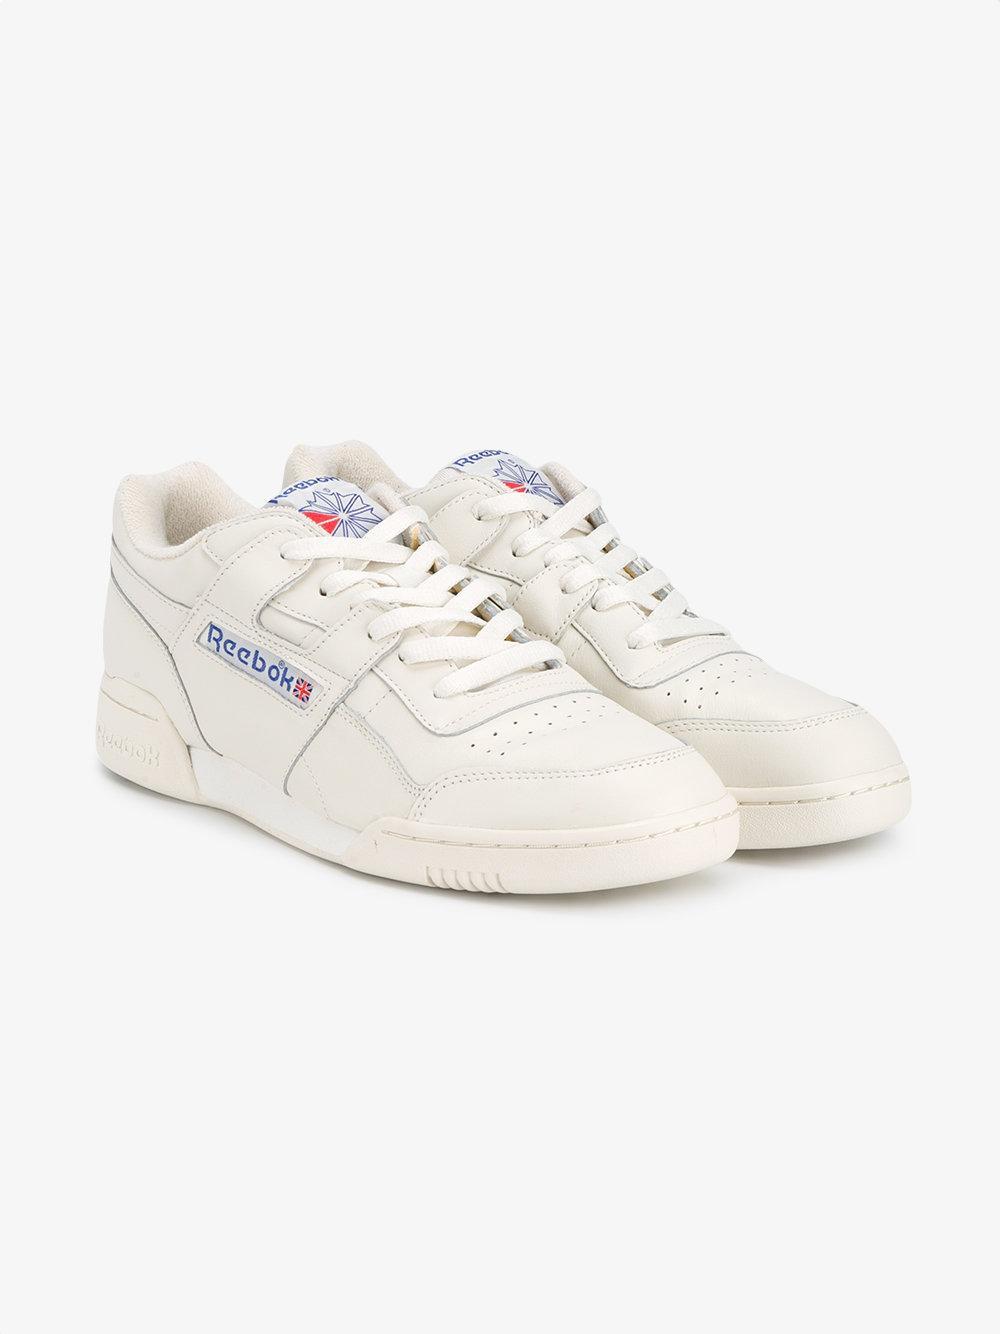 Reebok Workout Plus Vintage Sneakers for Men - Lyst 323ba91e1